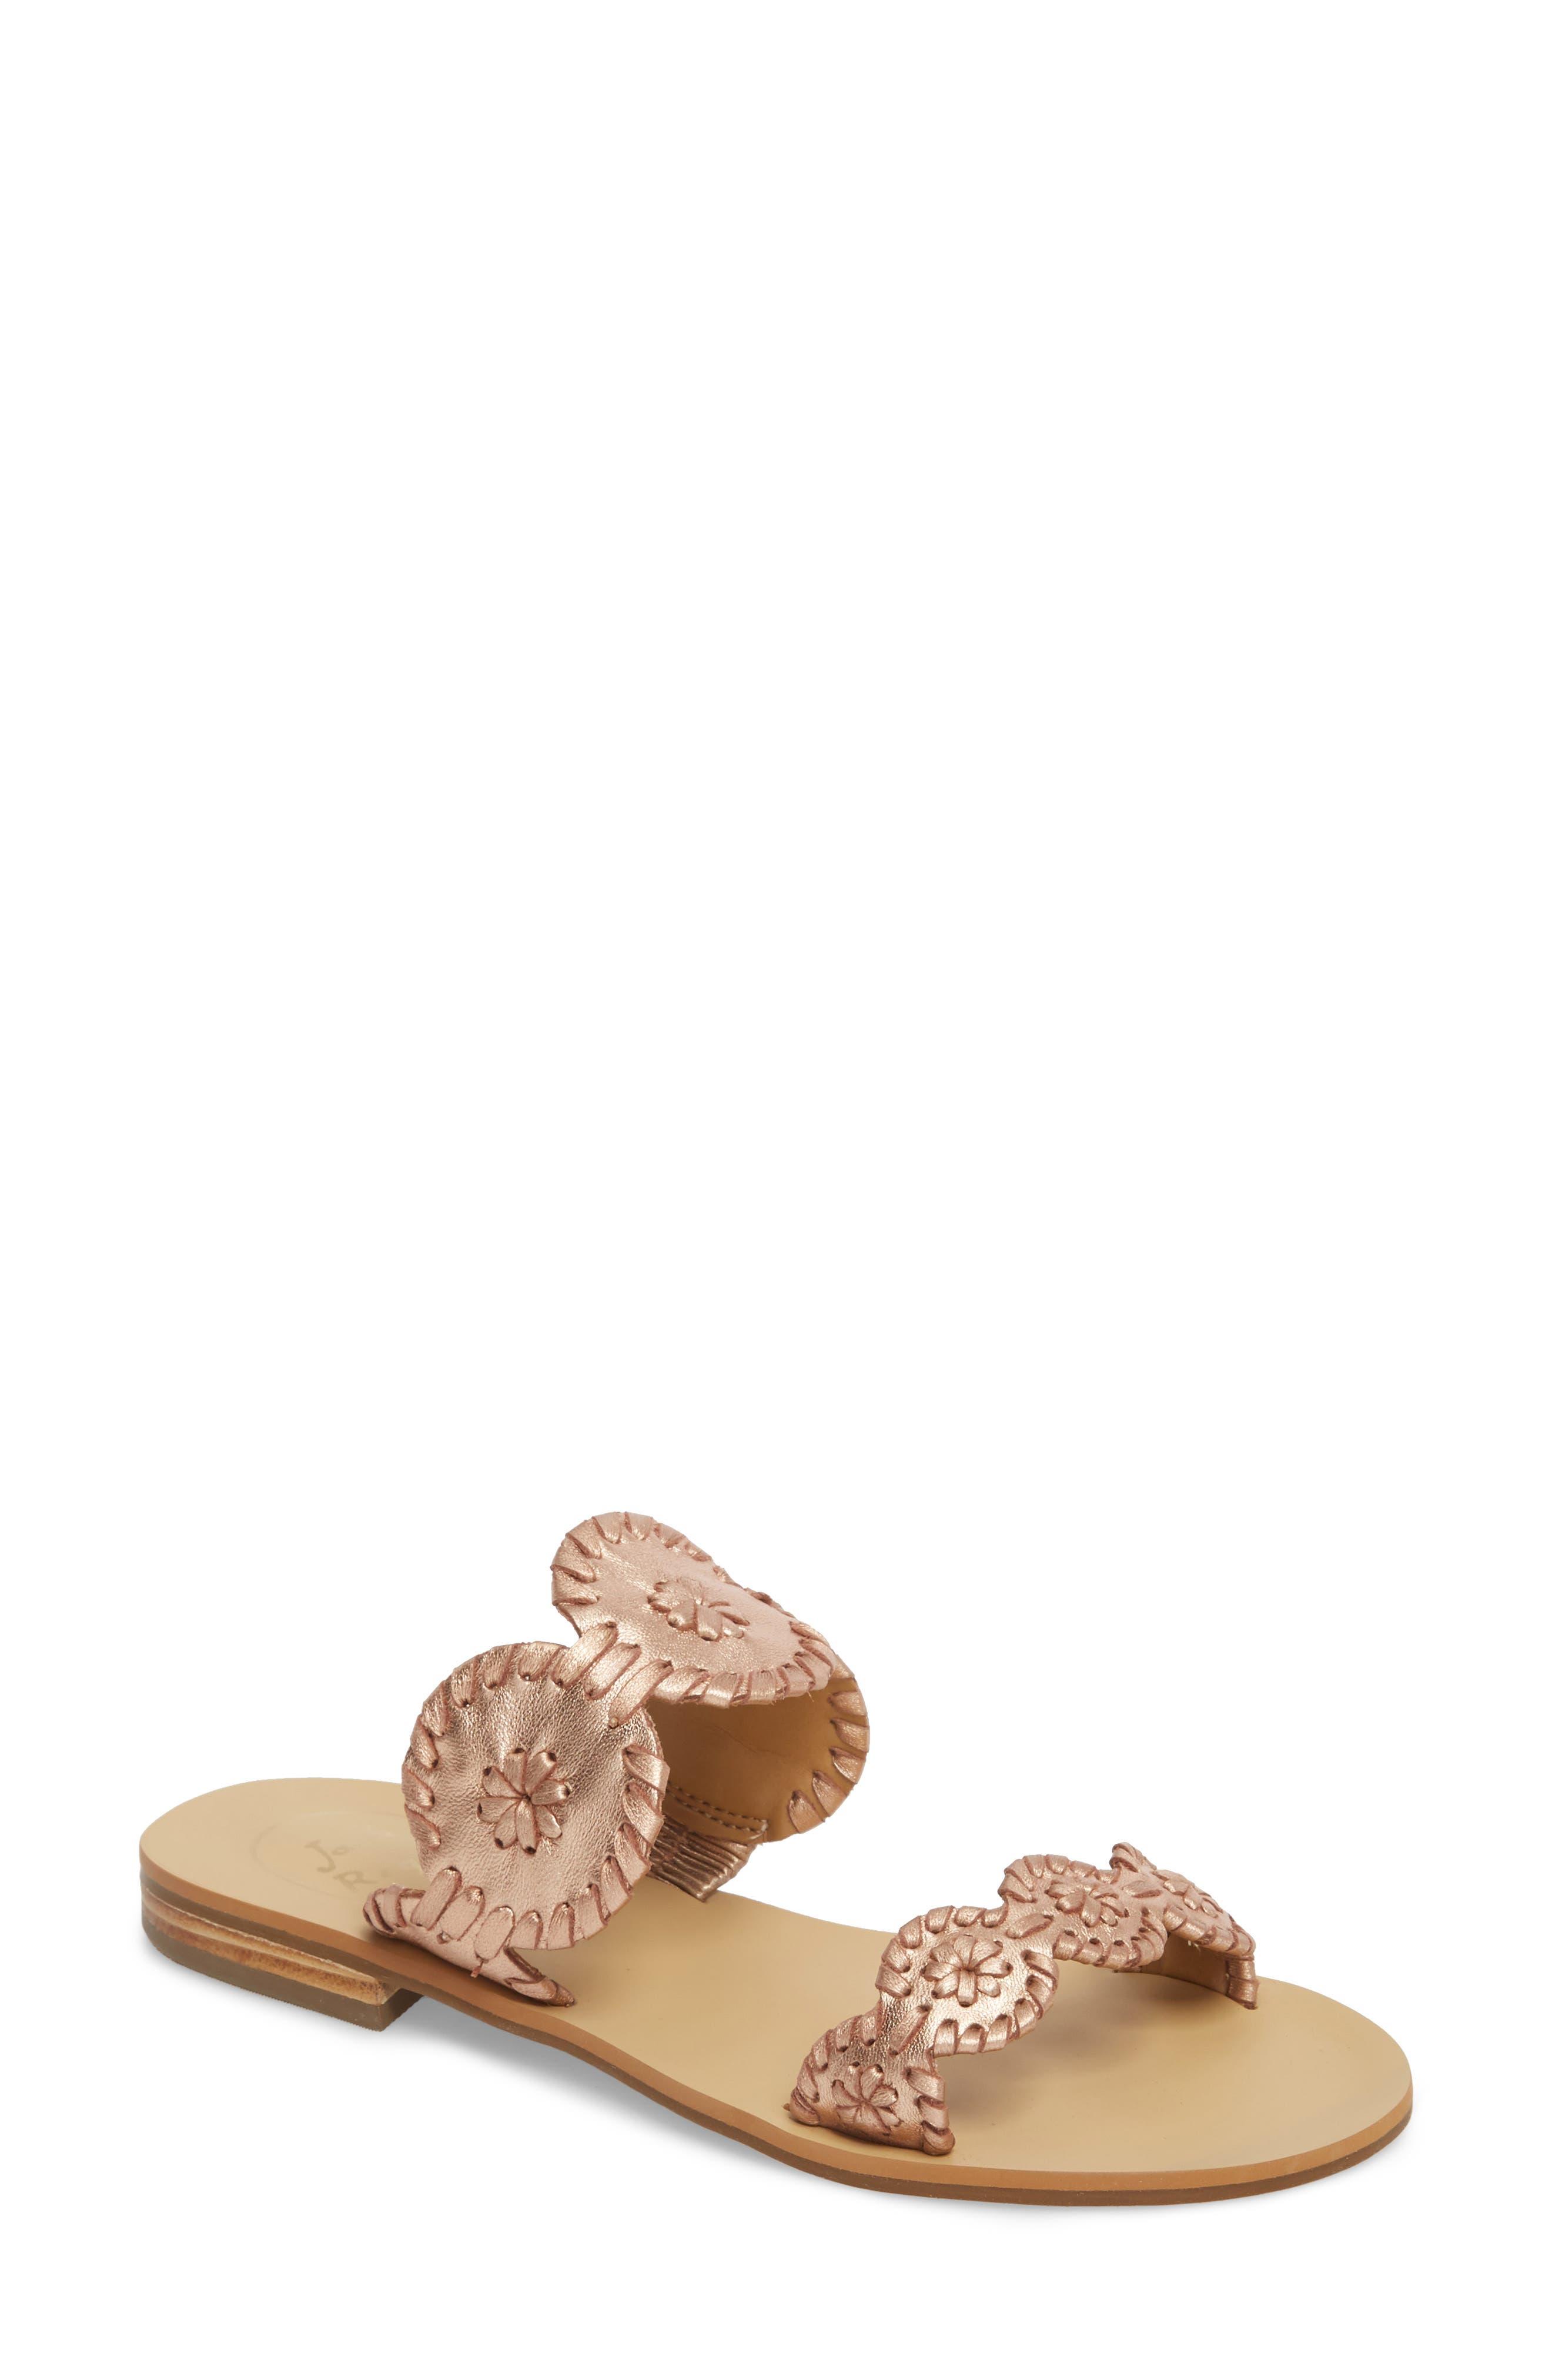 'Lauren' Sandal,                         Main,                         color, Rose Gold Leather